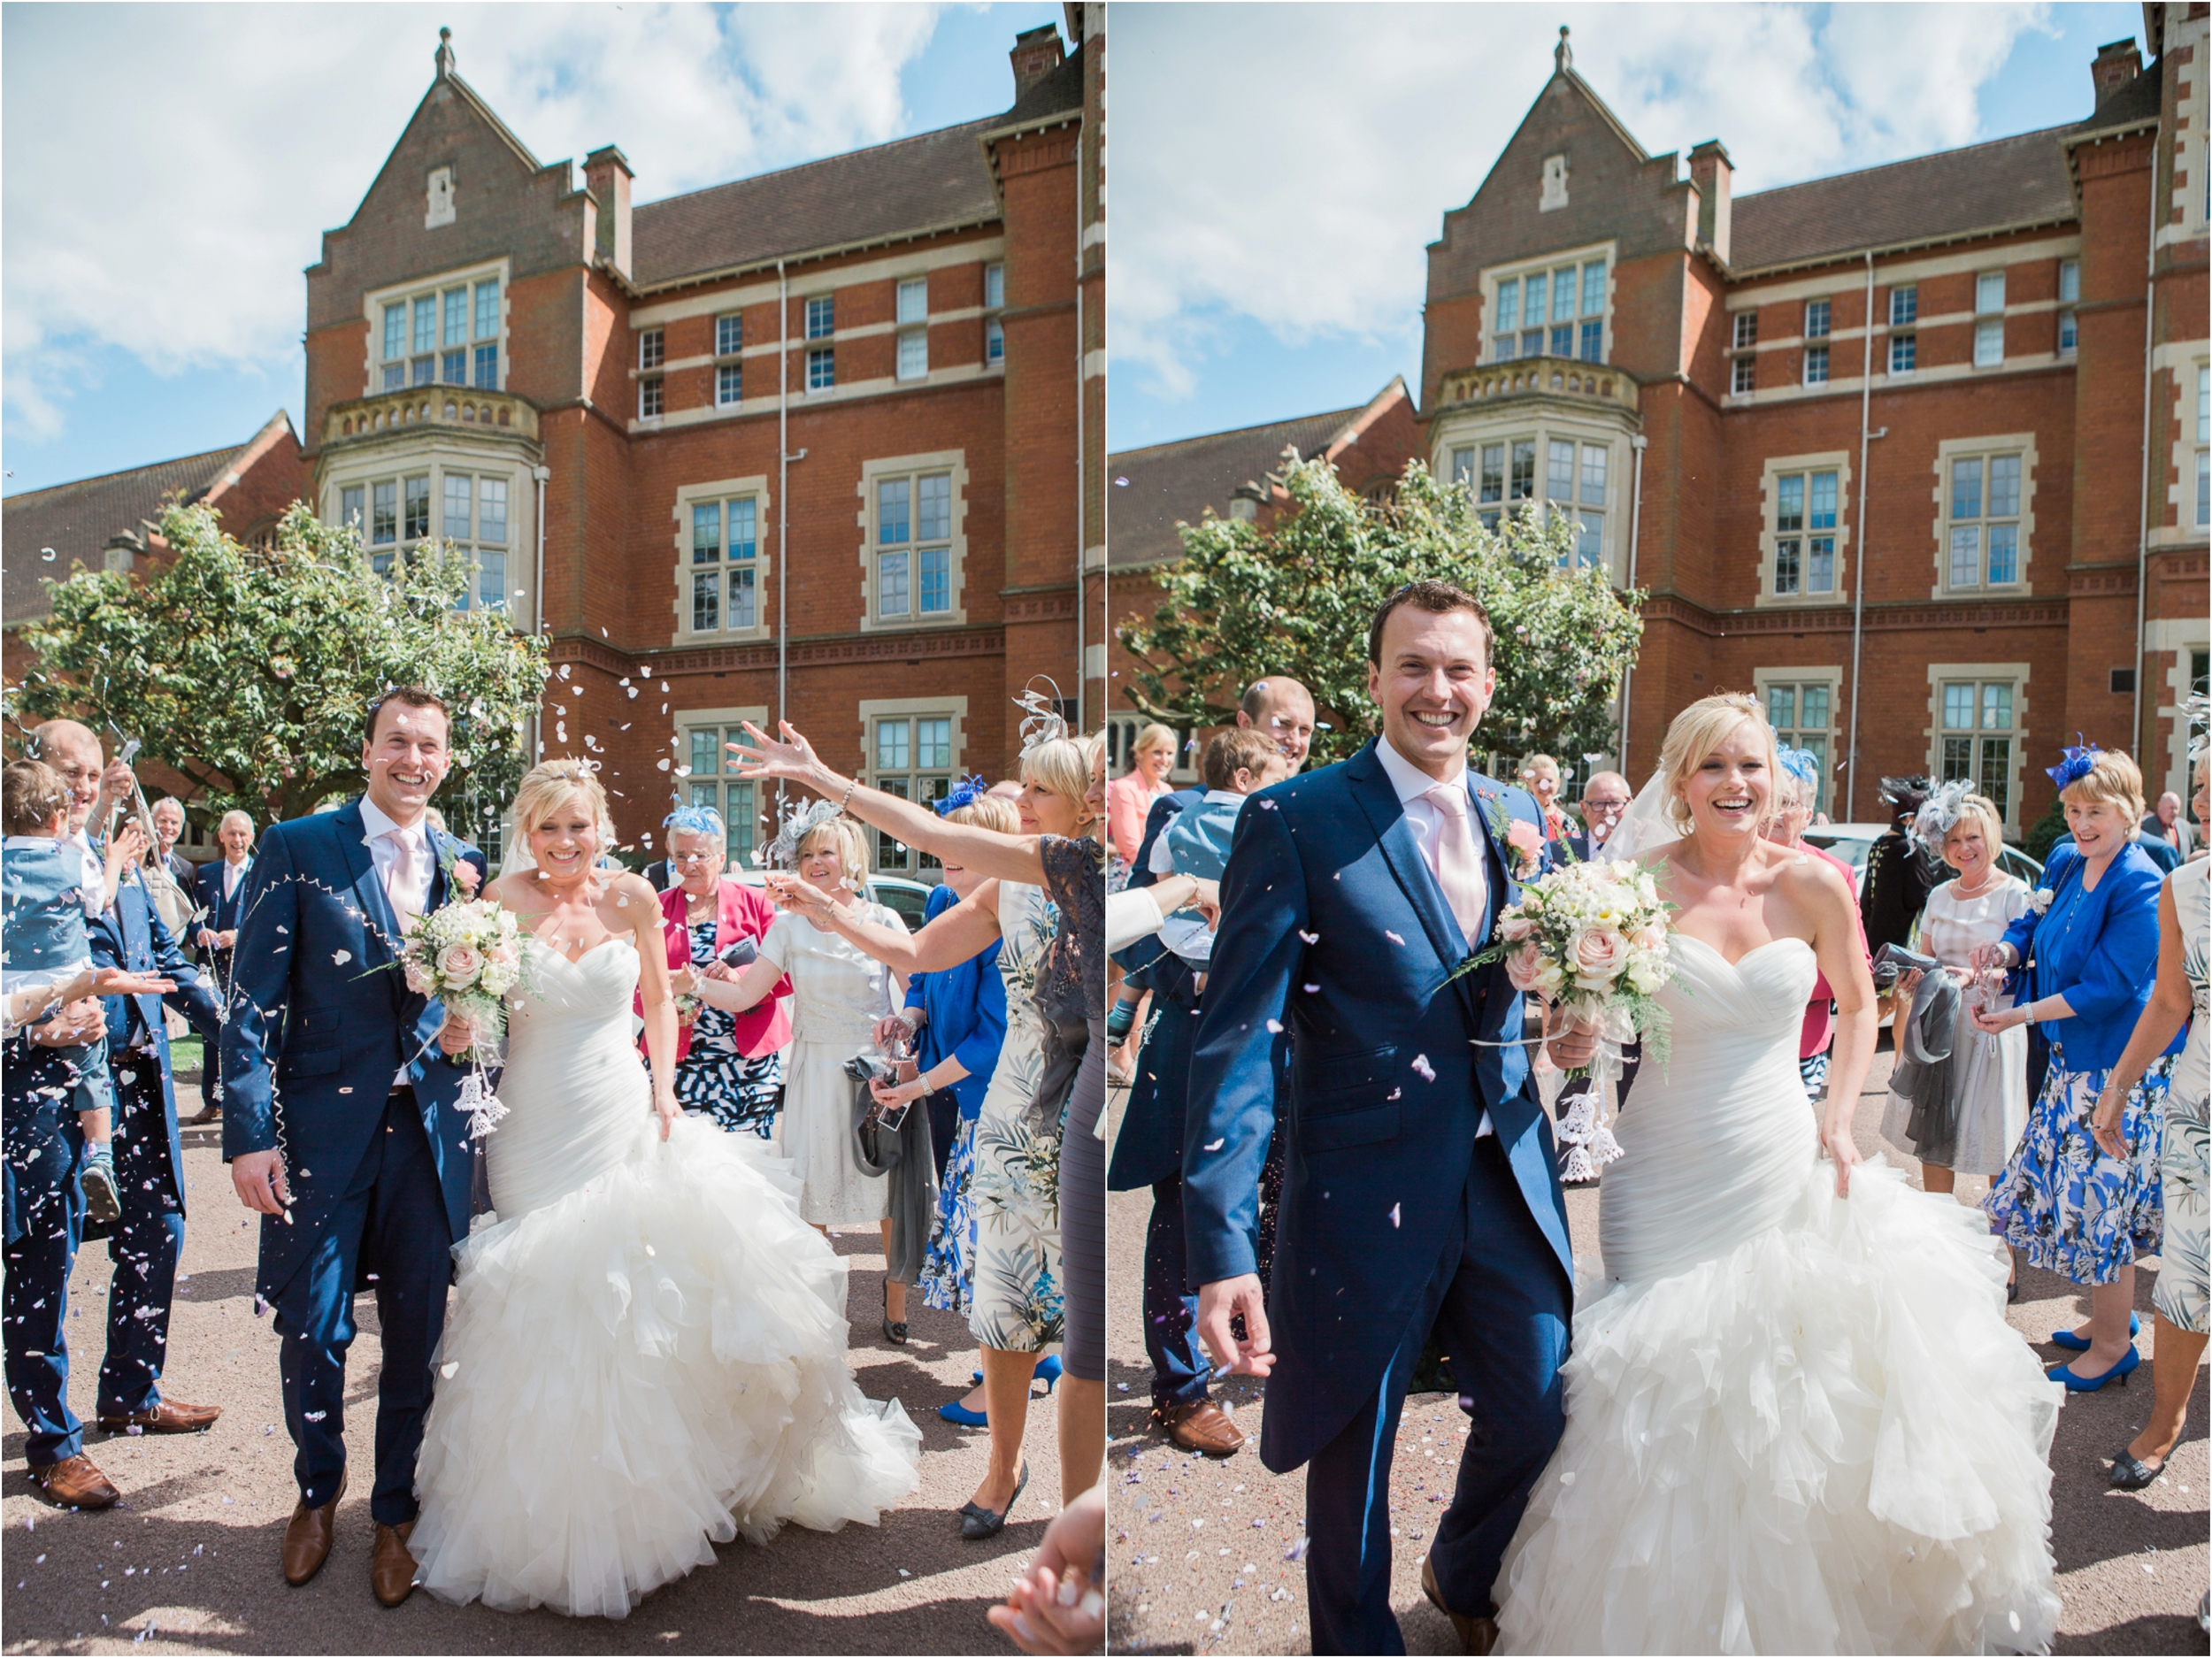 Sophie Evans Photography, Gus & Emma Farm Wedding, Warwick School Wedding. Warwickshire Wedding Photographer-52.jpg